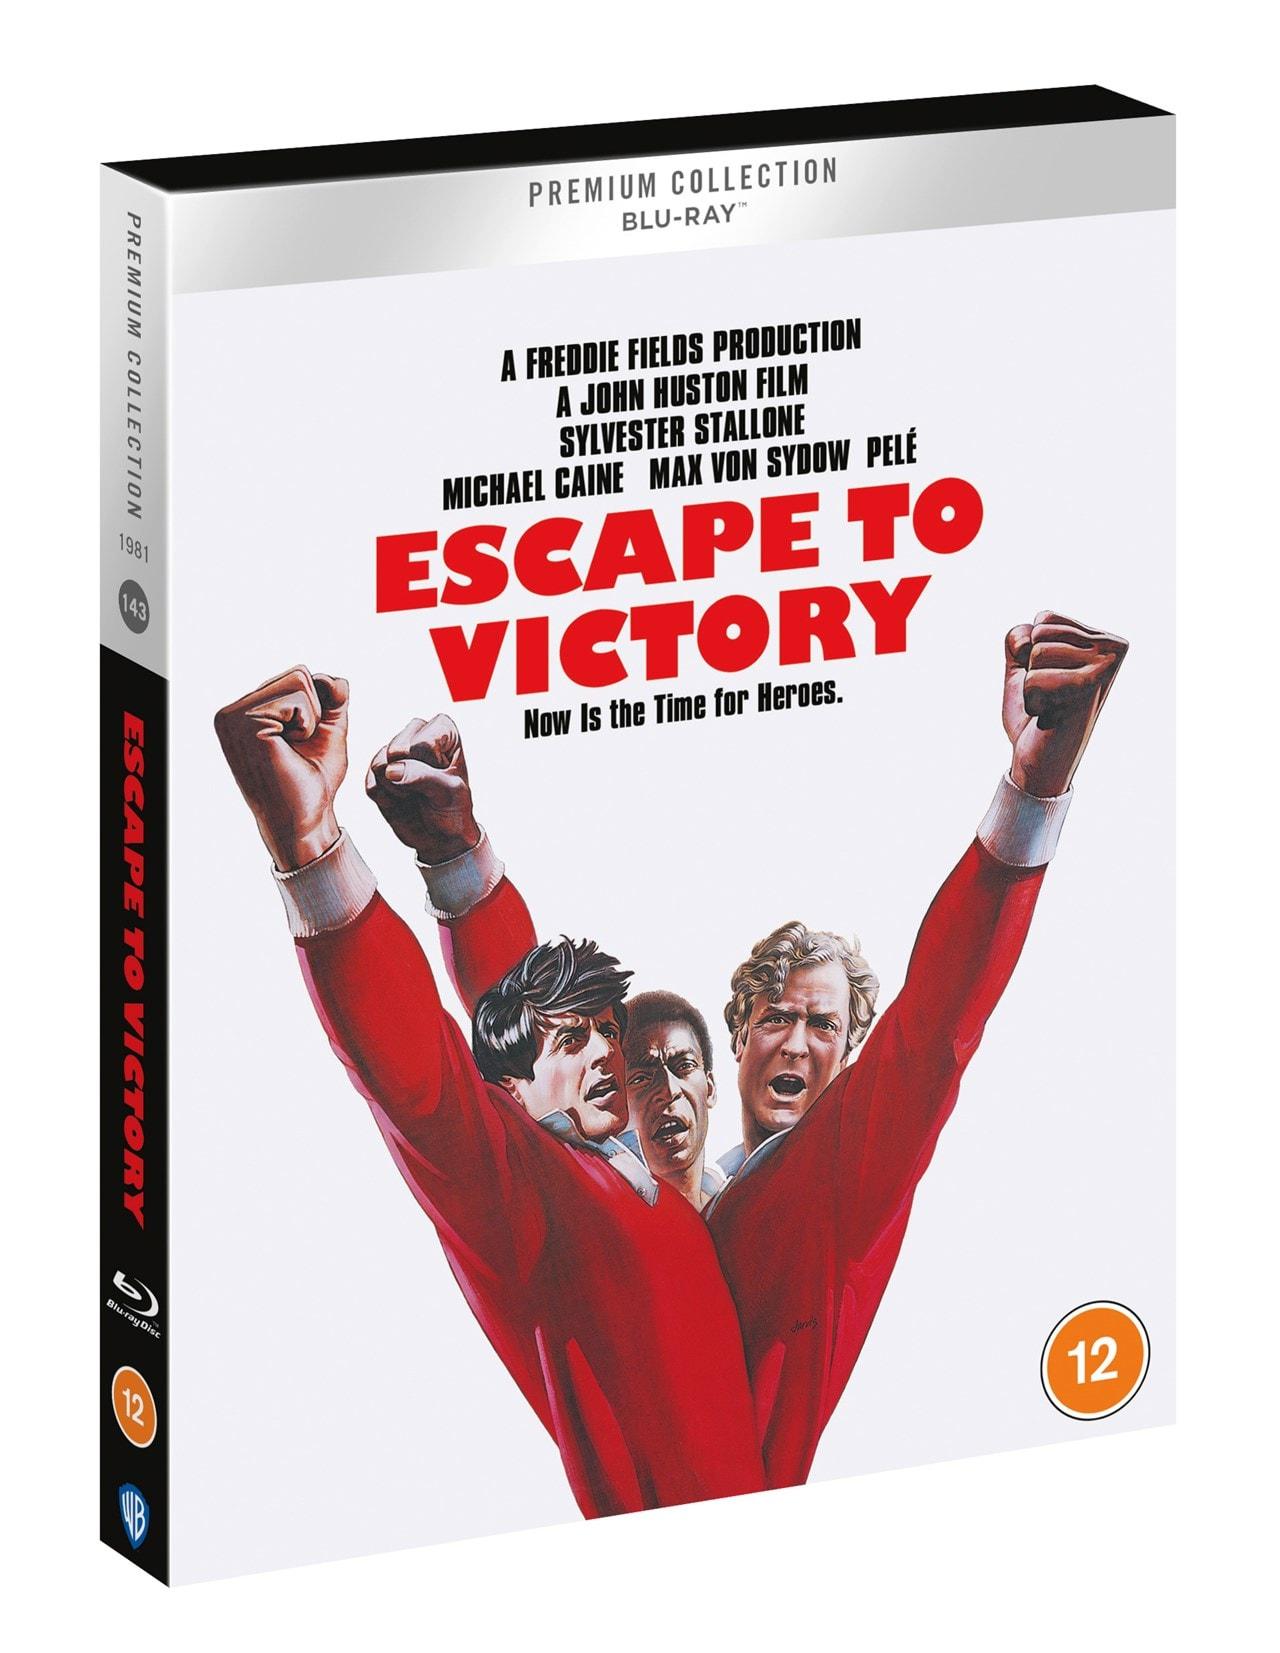 Escape to Victory (hmv Exclusive) - The Premium Collection - 2